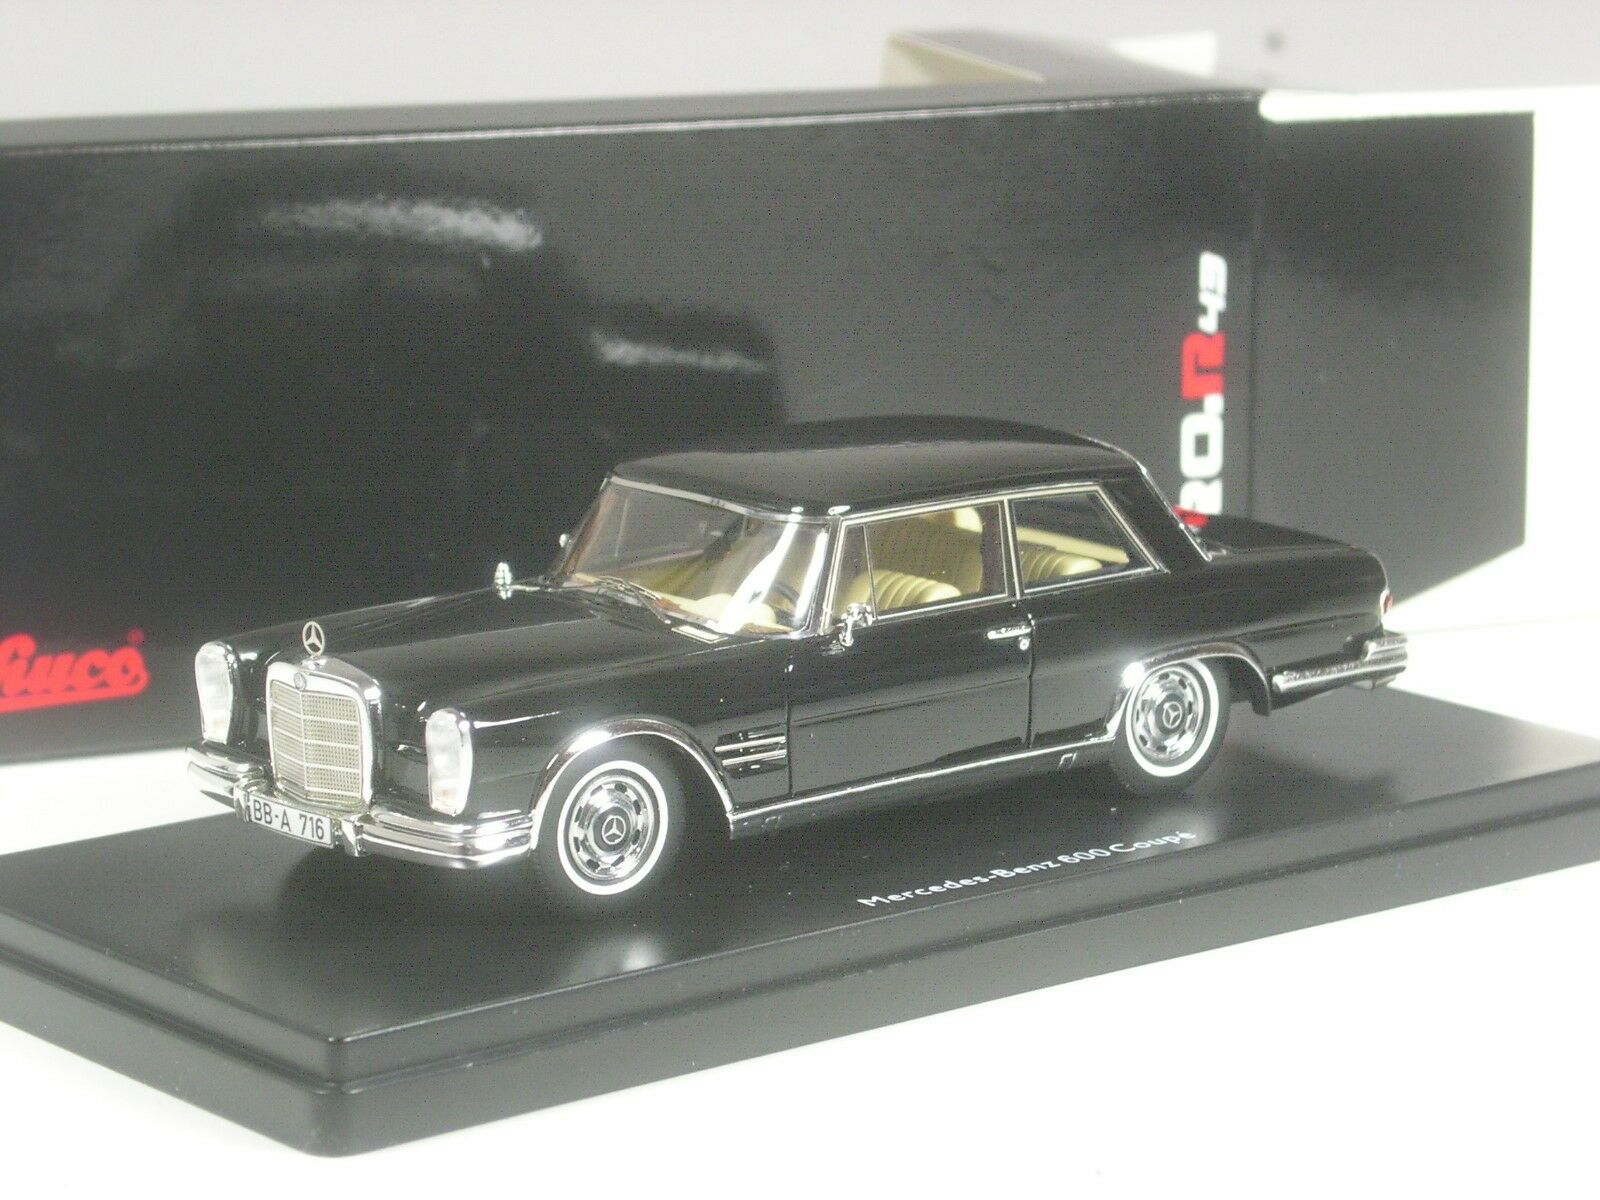 (ki-06-19) Schuco pro. r Mercedes-Benz 600 Coupé en 1 43 dans neuf dans sa boîte